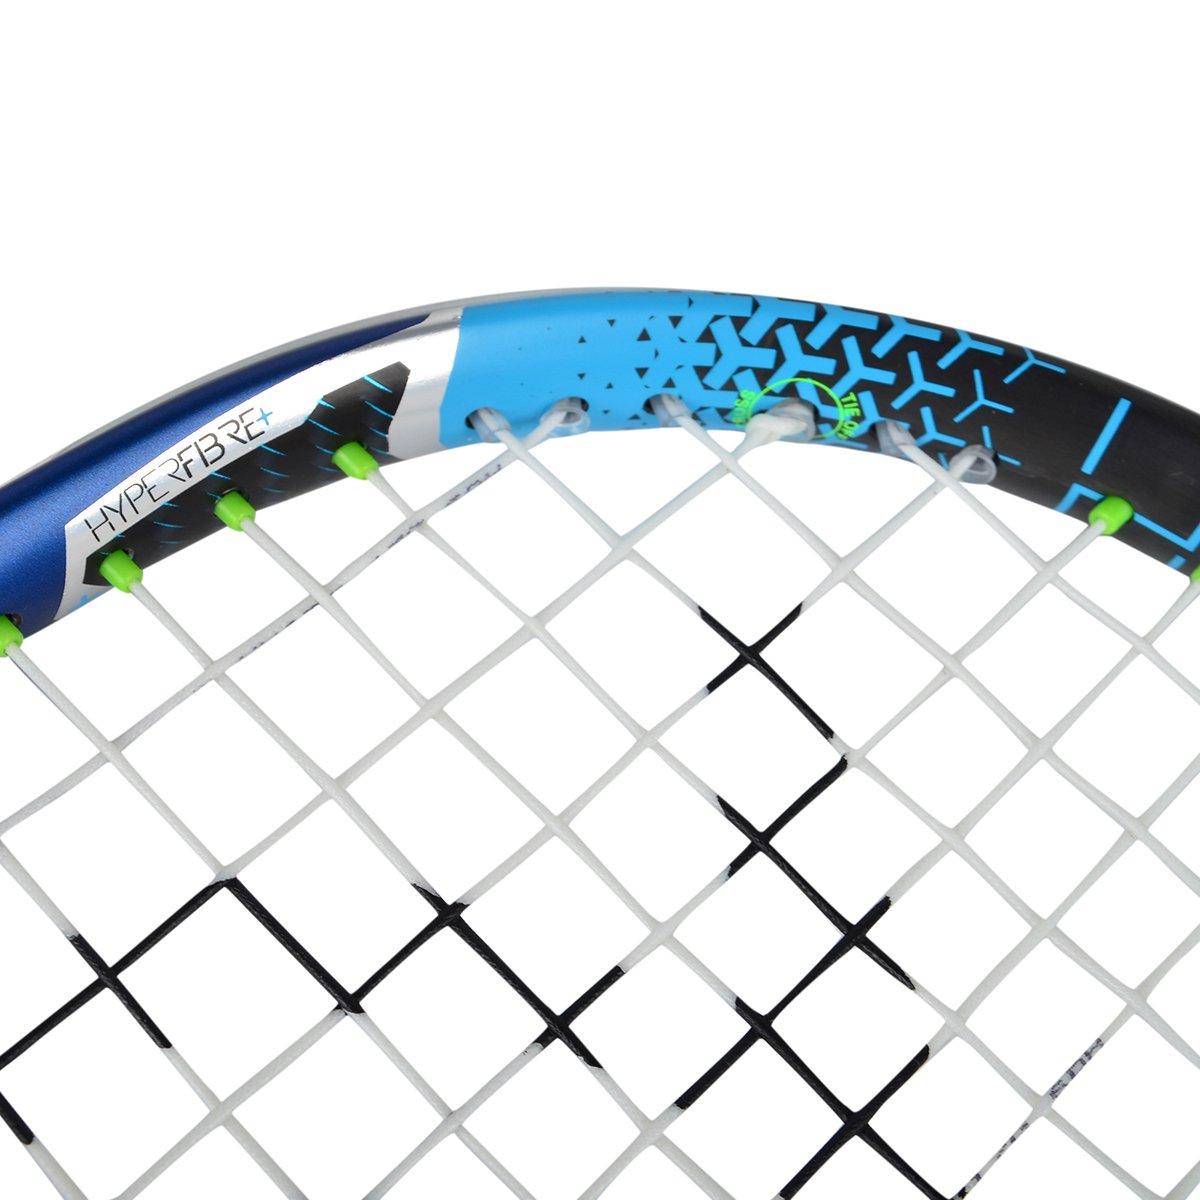 Dunlop 773252 Hyperfibre Plus Evolution Pro Nick Matthew Squashschl/äger Blau